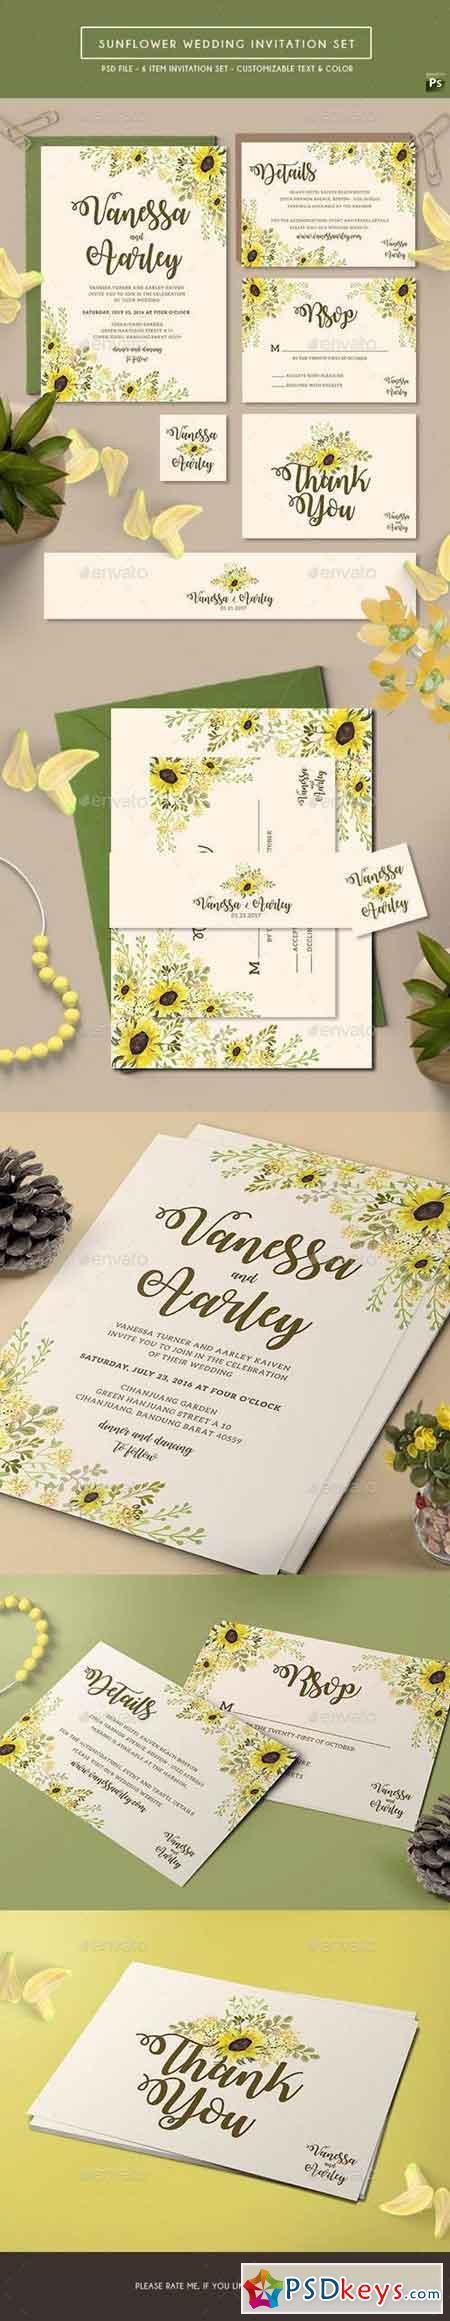 Sunflower Wedding Invitation Set 17711228